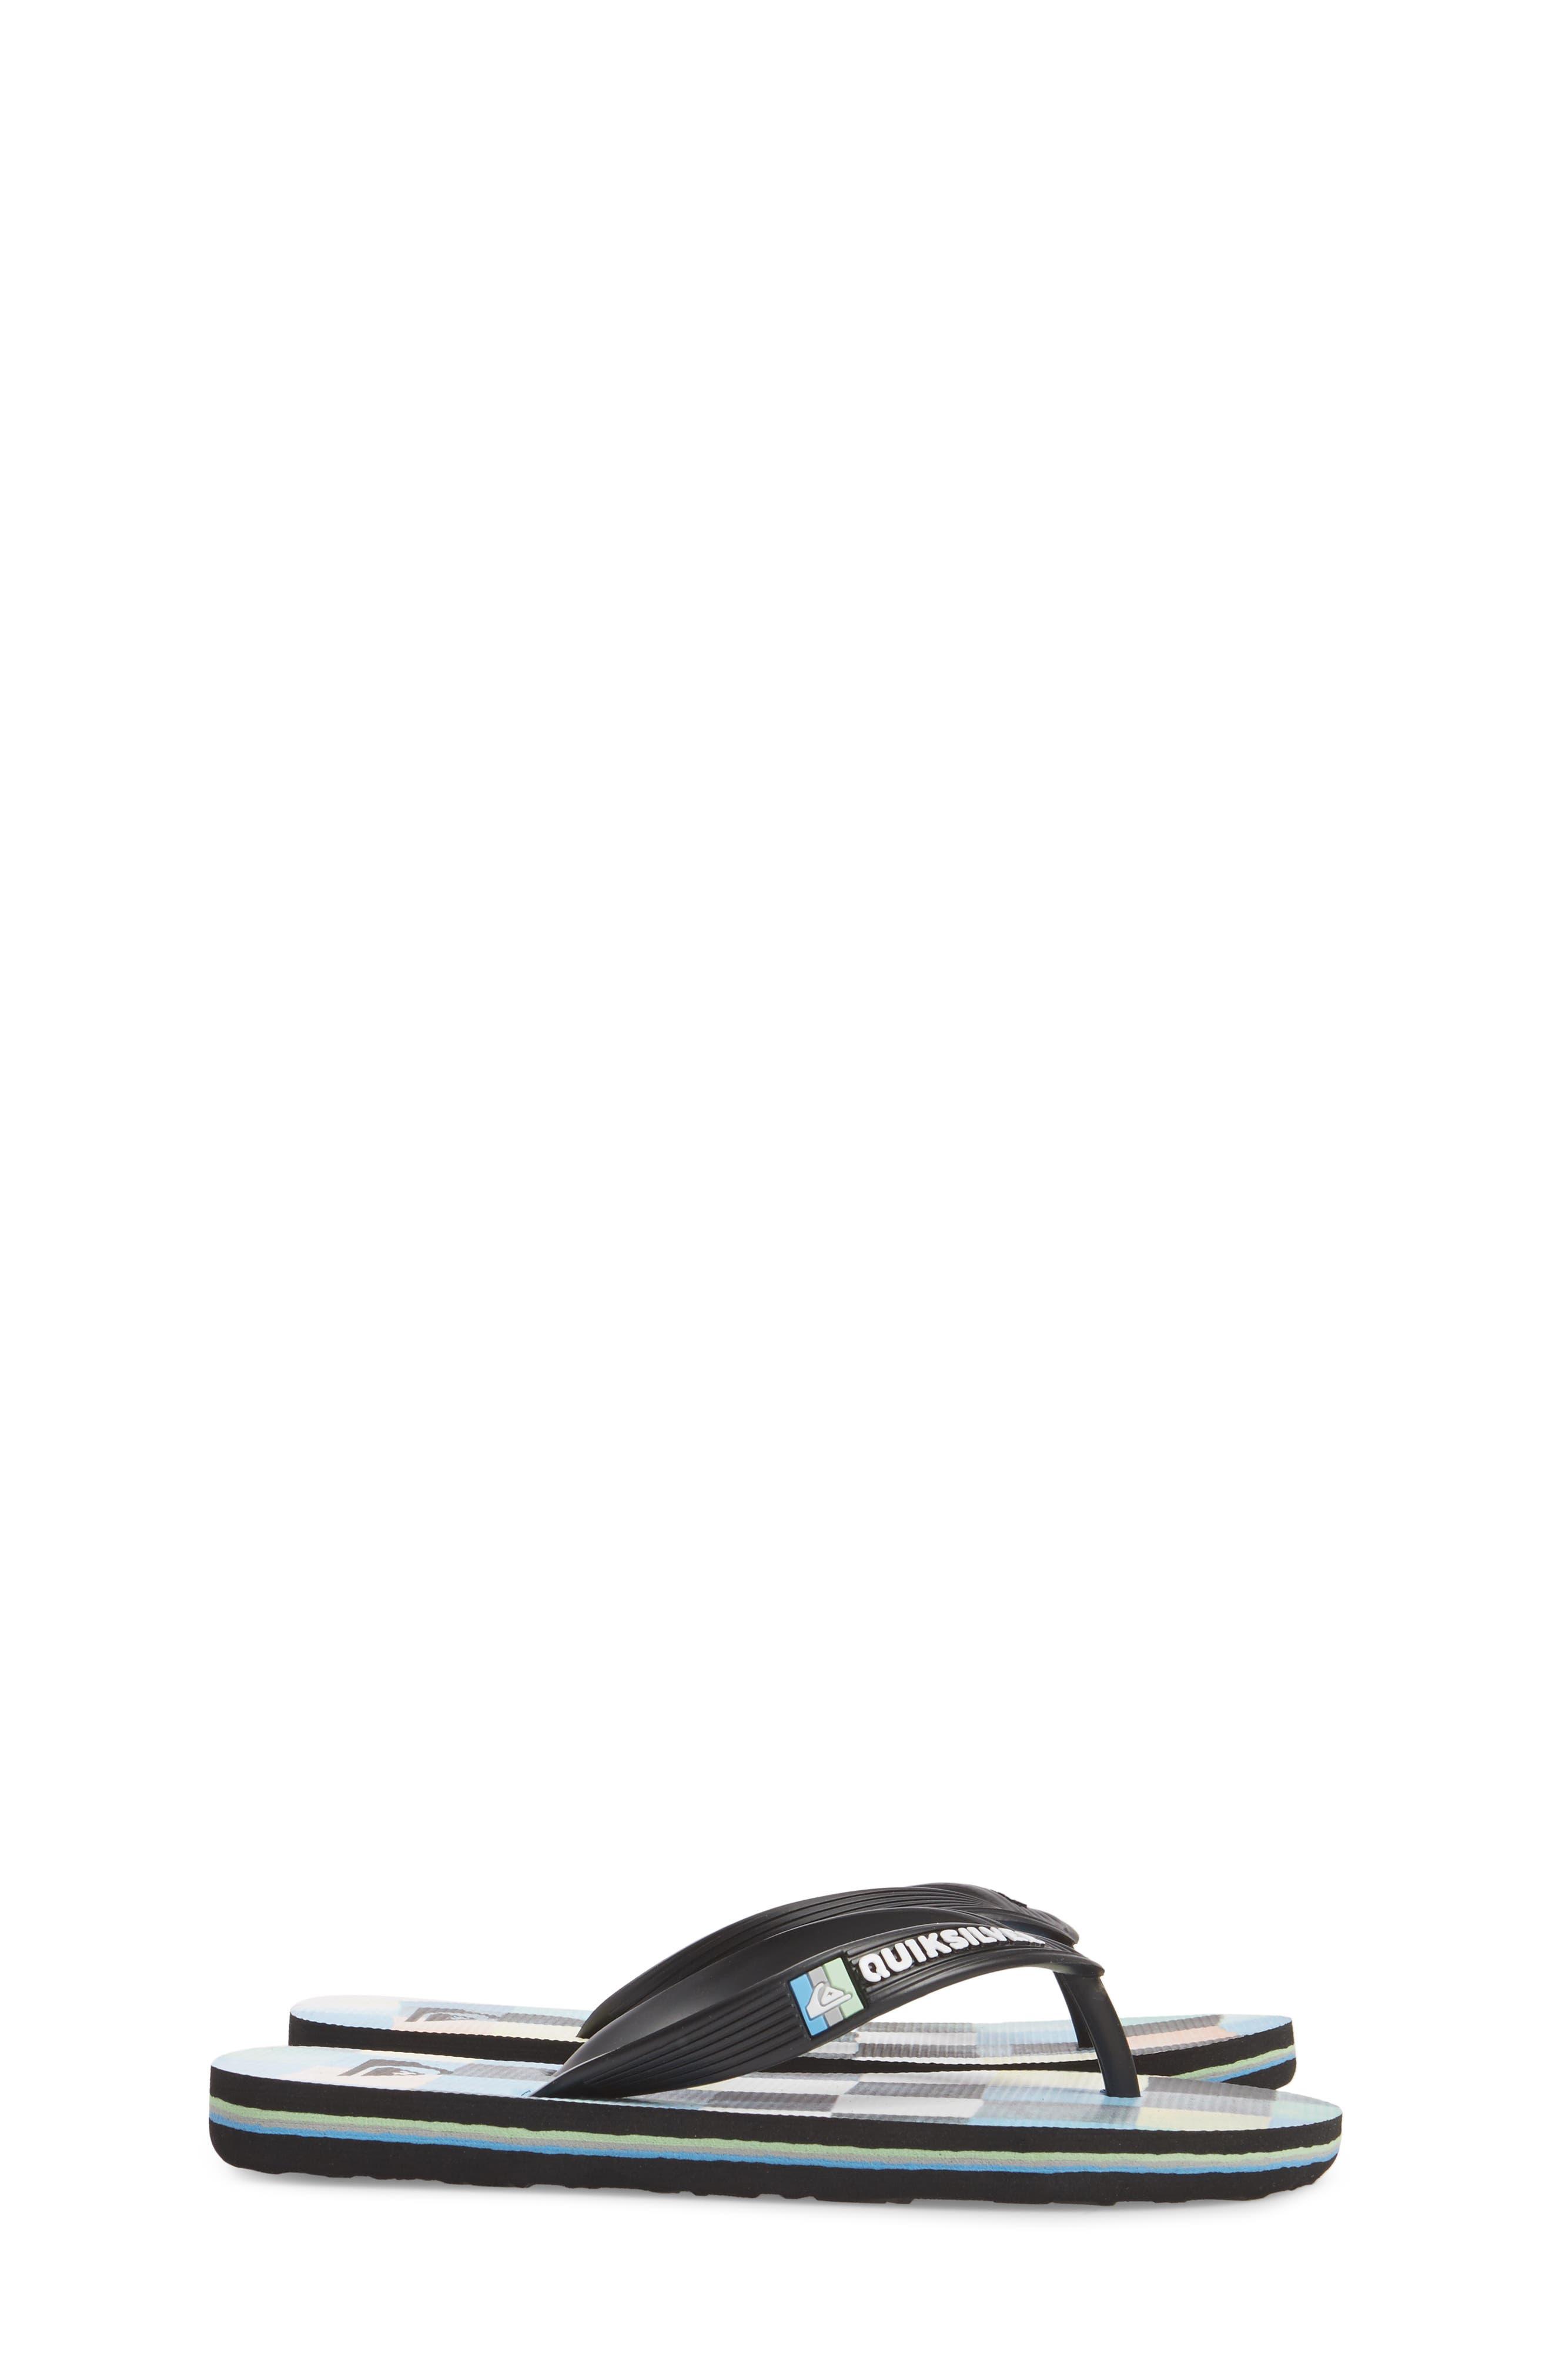 Molokai Resin Flip Flop,                             Alternate thumbnail 4, color,                             001